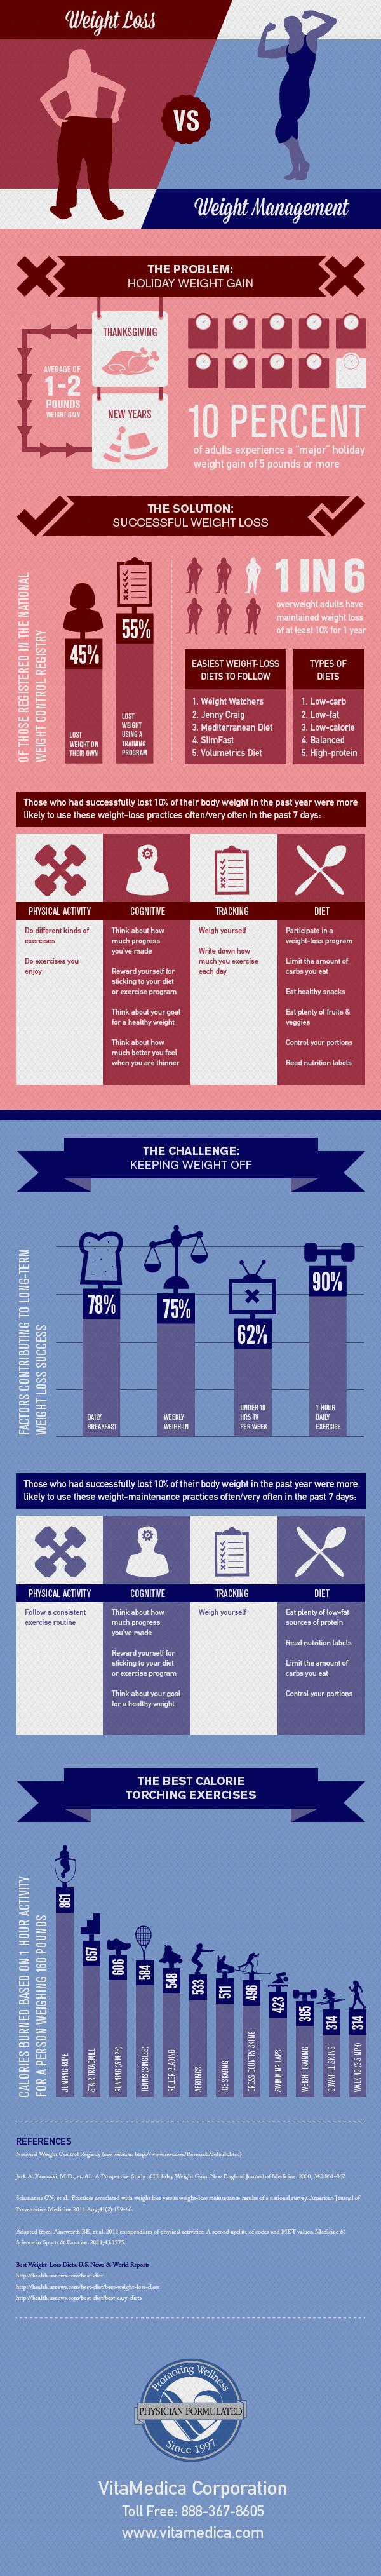 Weight-Loss-vs.-Weight-Maintenance-Infographic